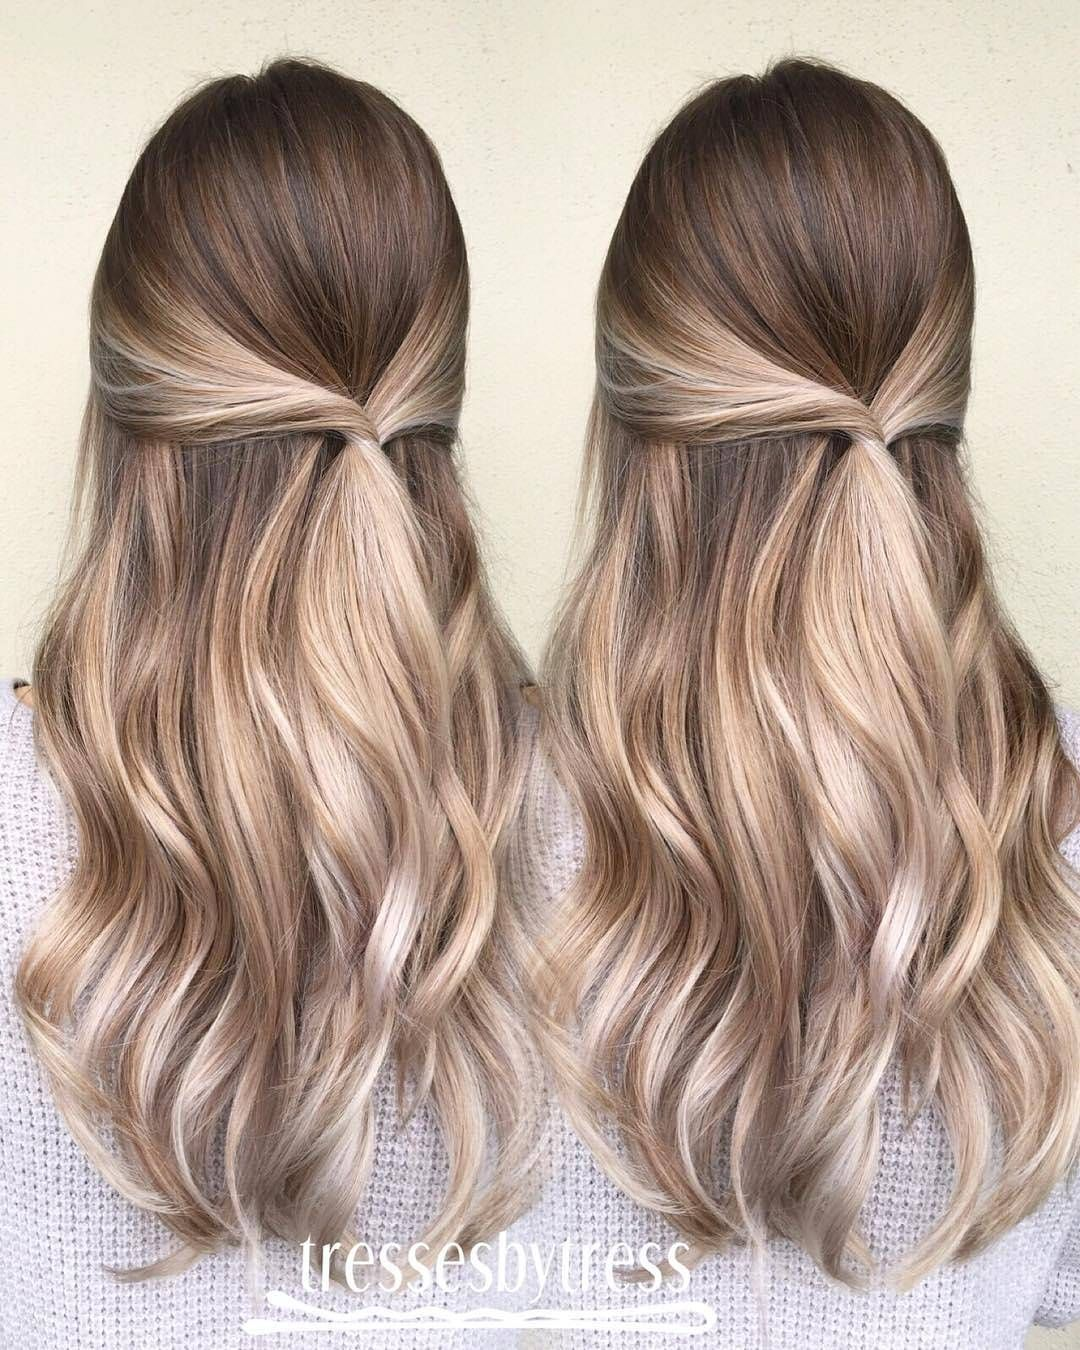 blonde brown u caramel balayage hair color ideas you shouldnut